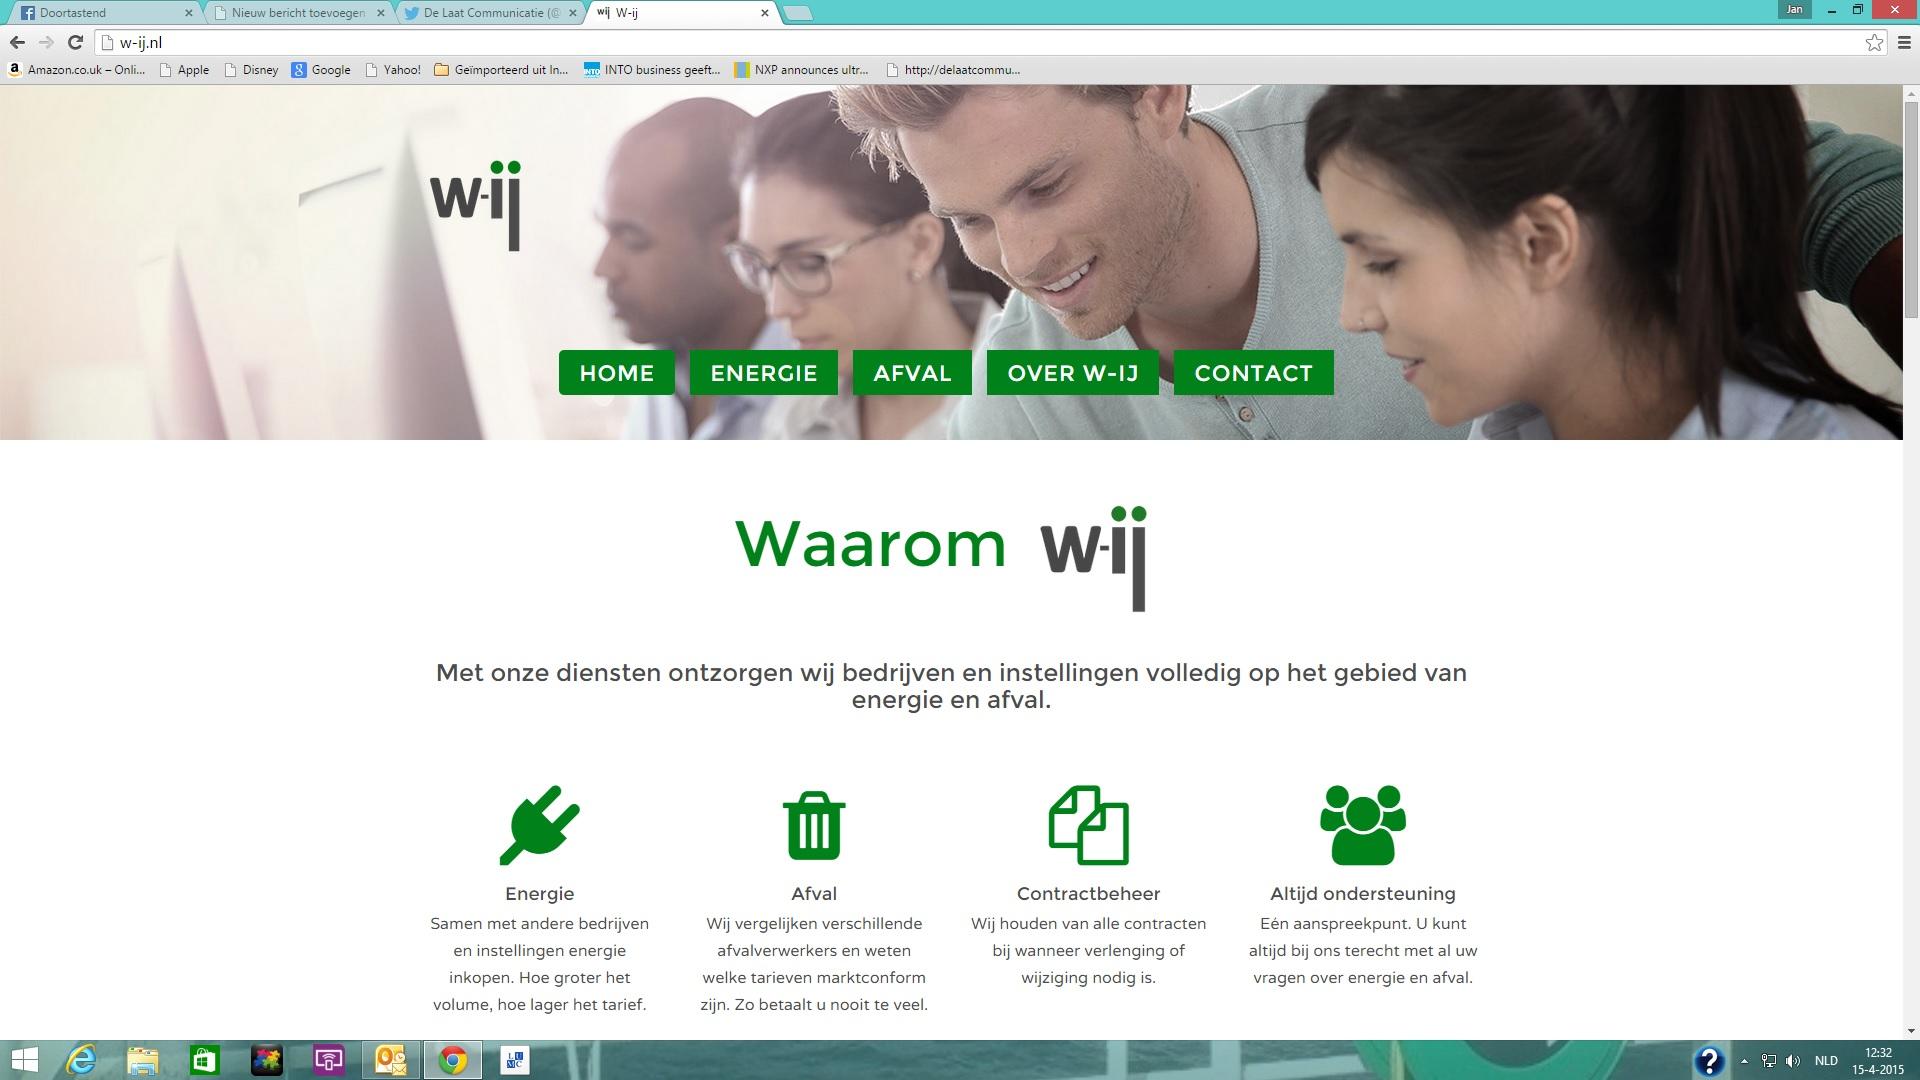 webteksten, duurzaamheid, energie, afval